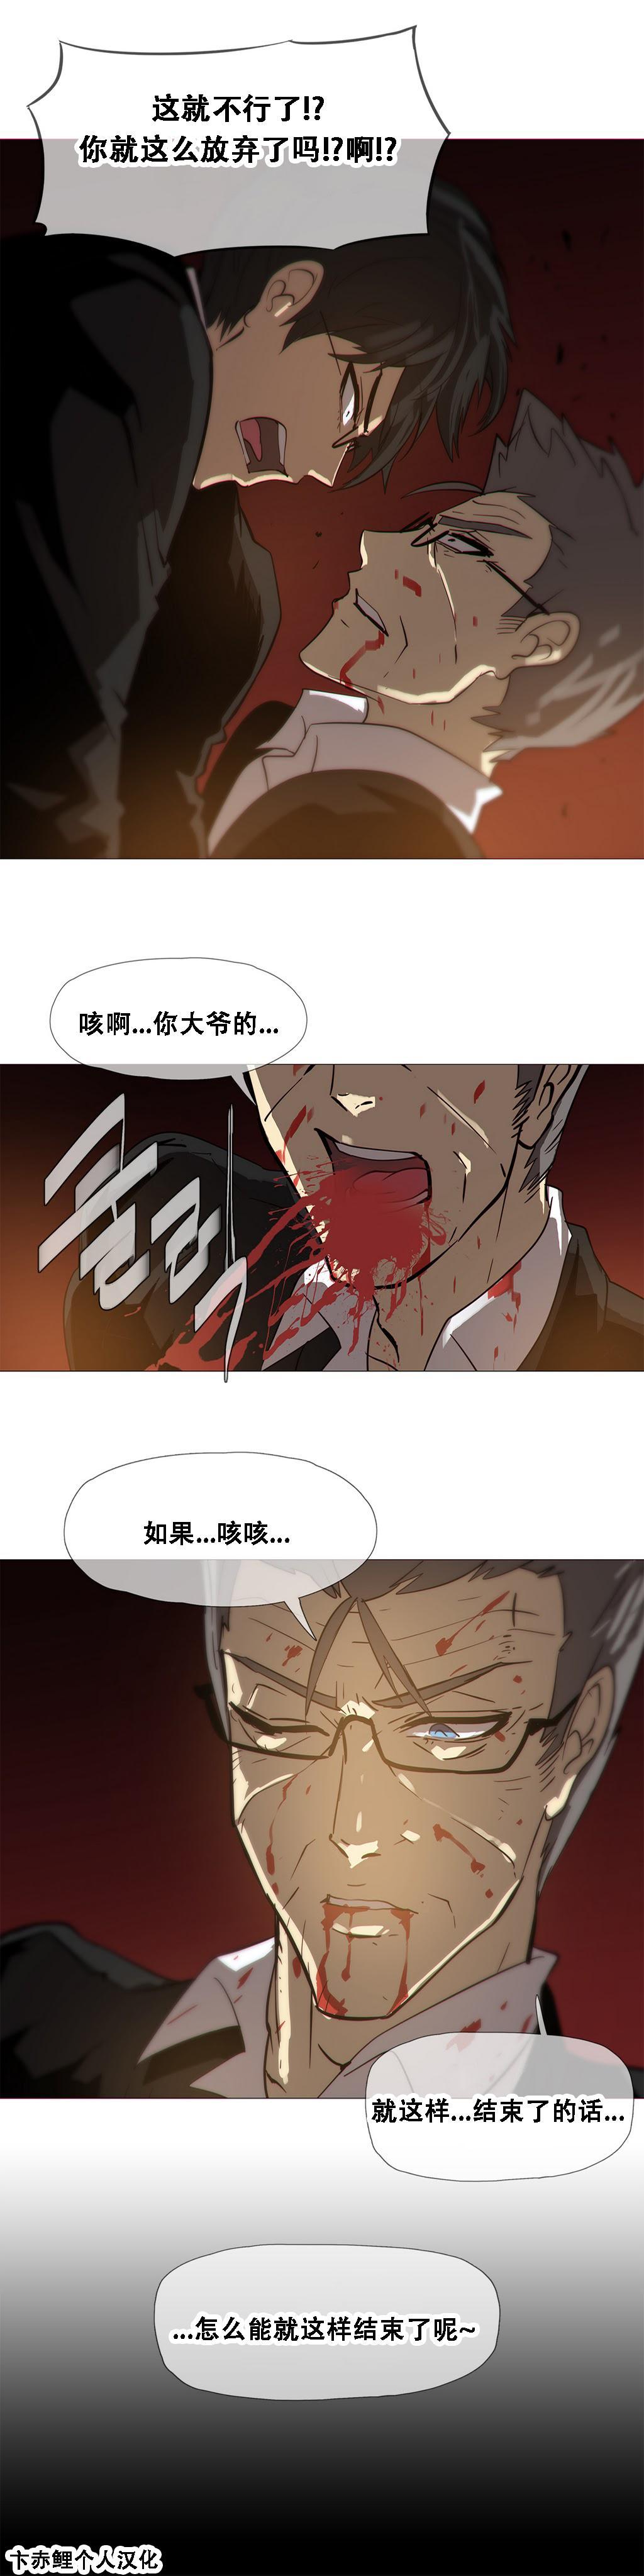 HouseHold Affairs 【卞赤鲤个人汉化】1~21话(持续更新中) 386